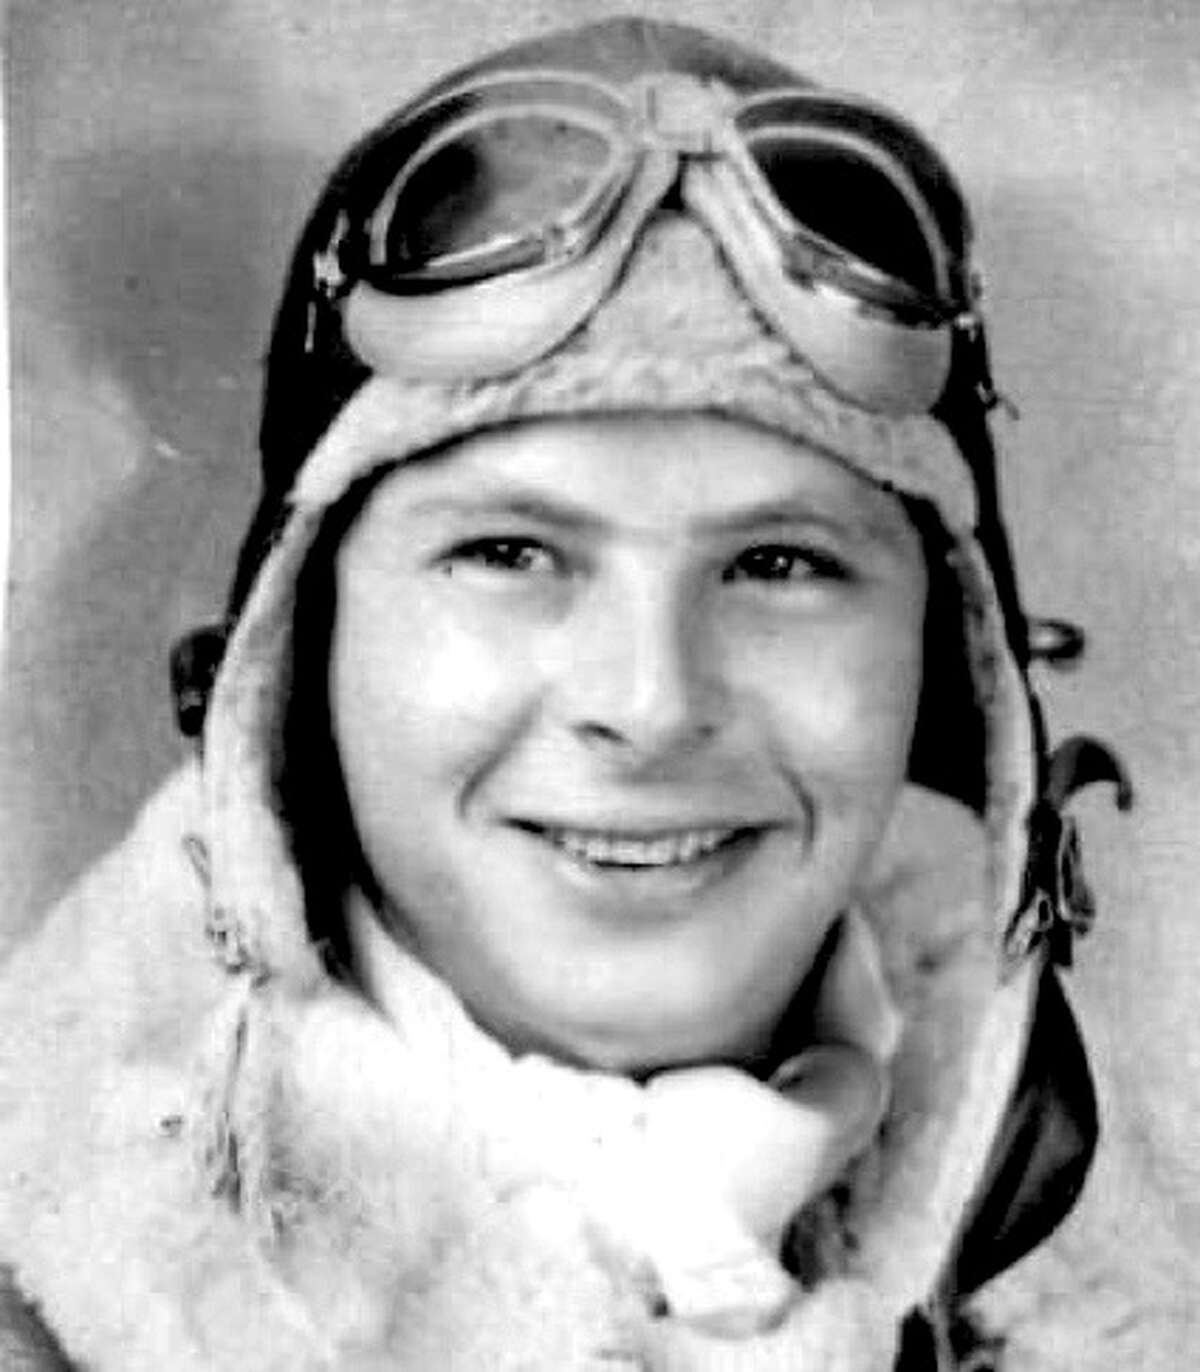 World War veteran Harley Ruth (shown in 1942) will be aboard the final Alamo Honor Flight.